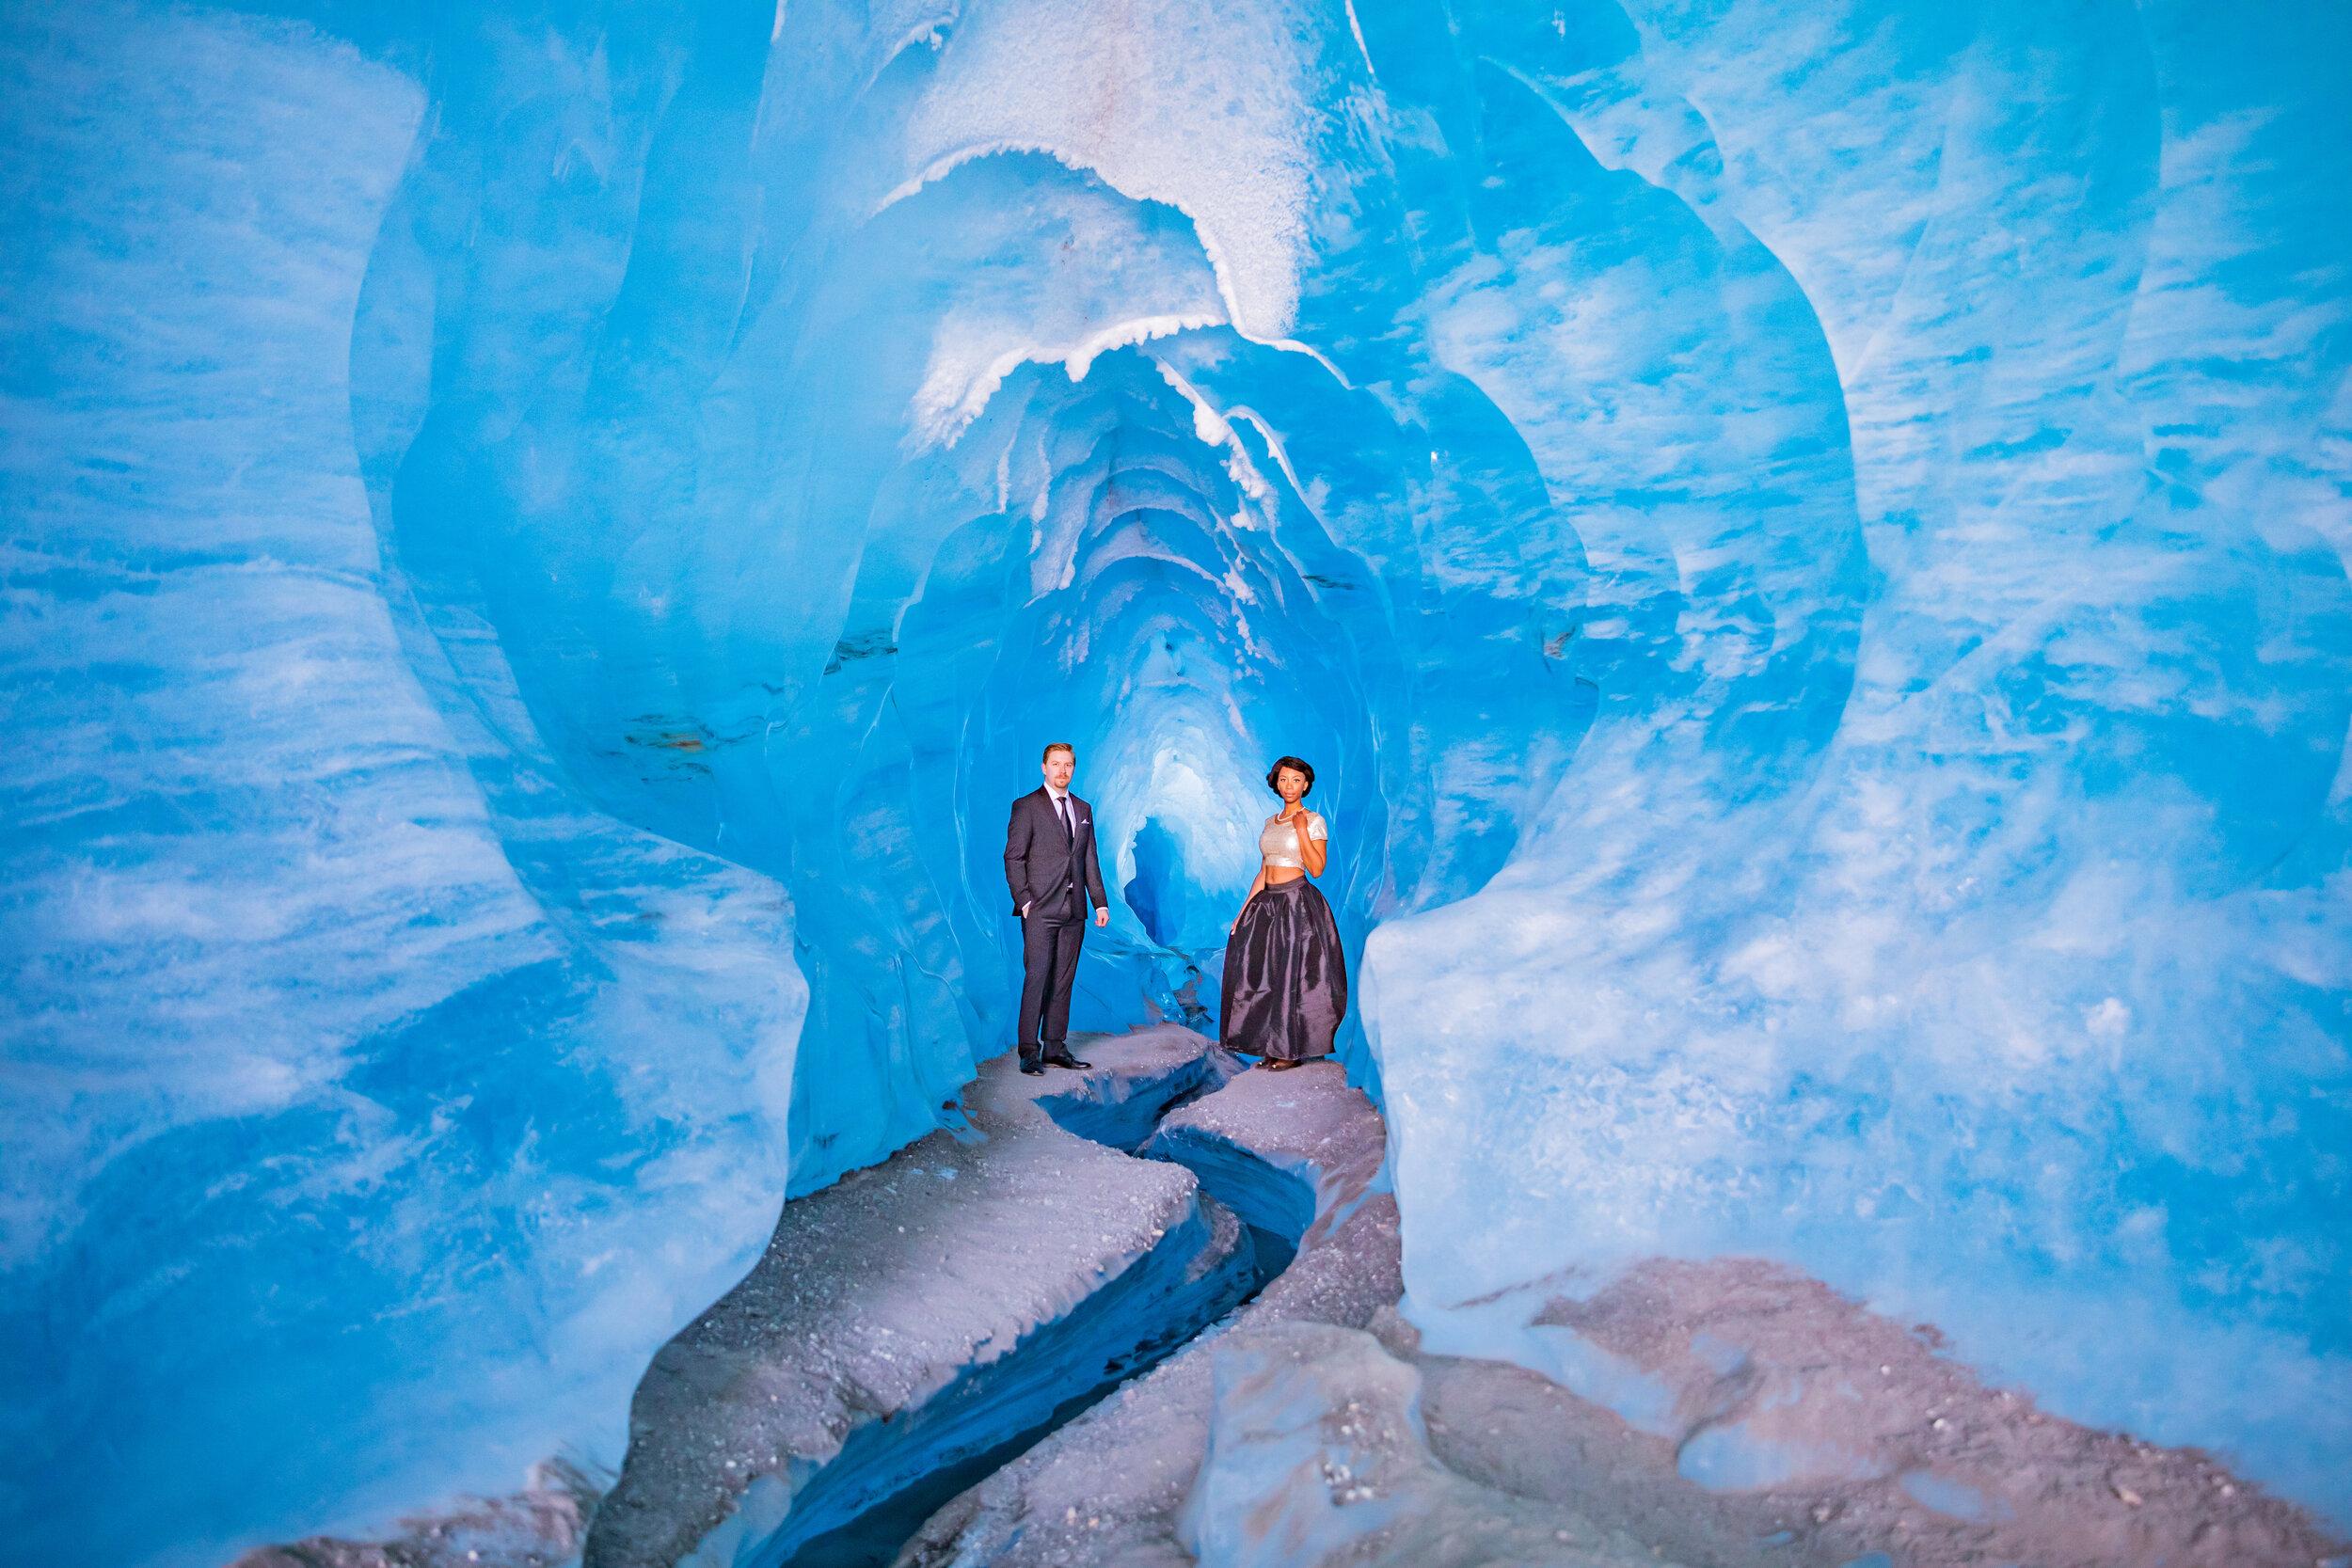 Engagement_Session_Matanuska_Glacier_Alaska_Emily_Lester_Photography-260.jpg